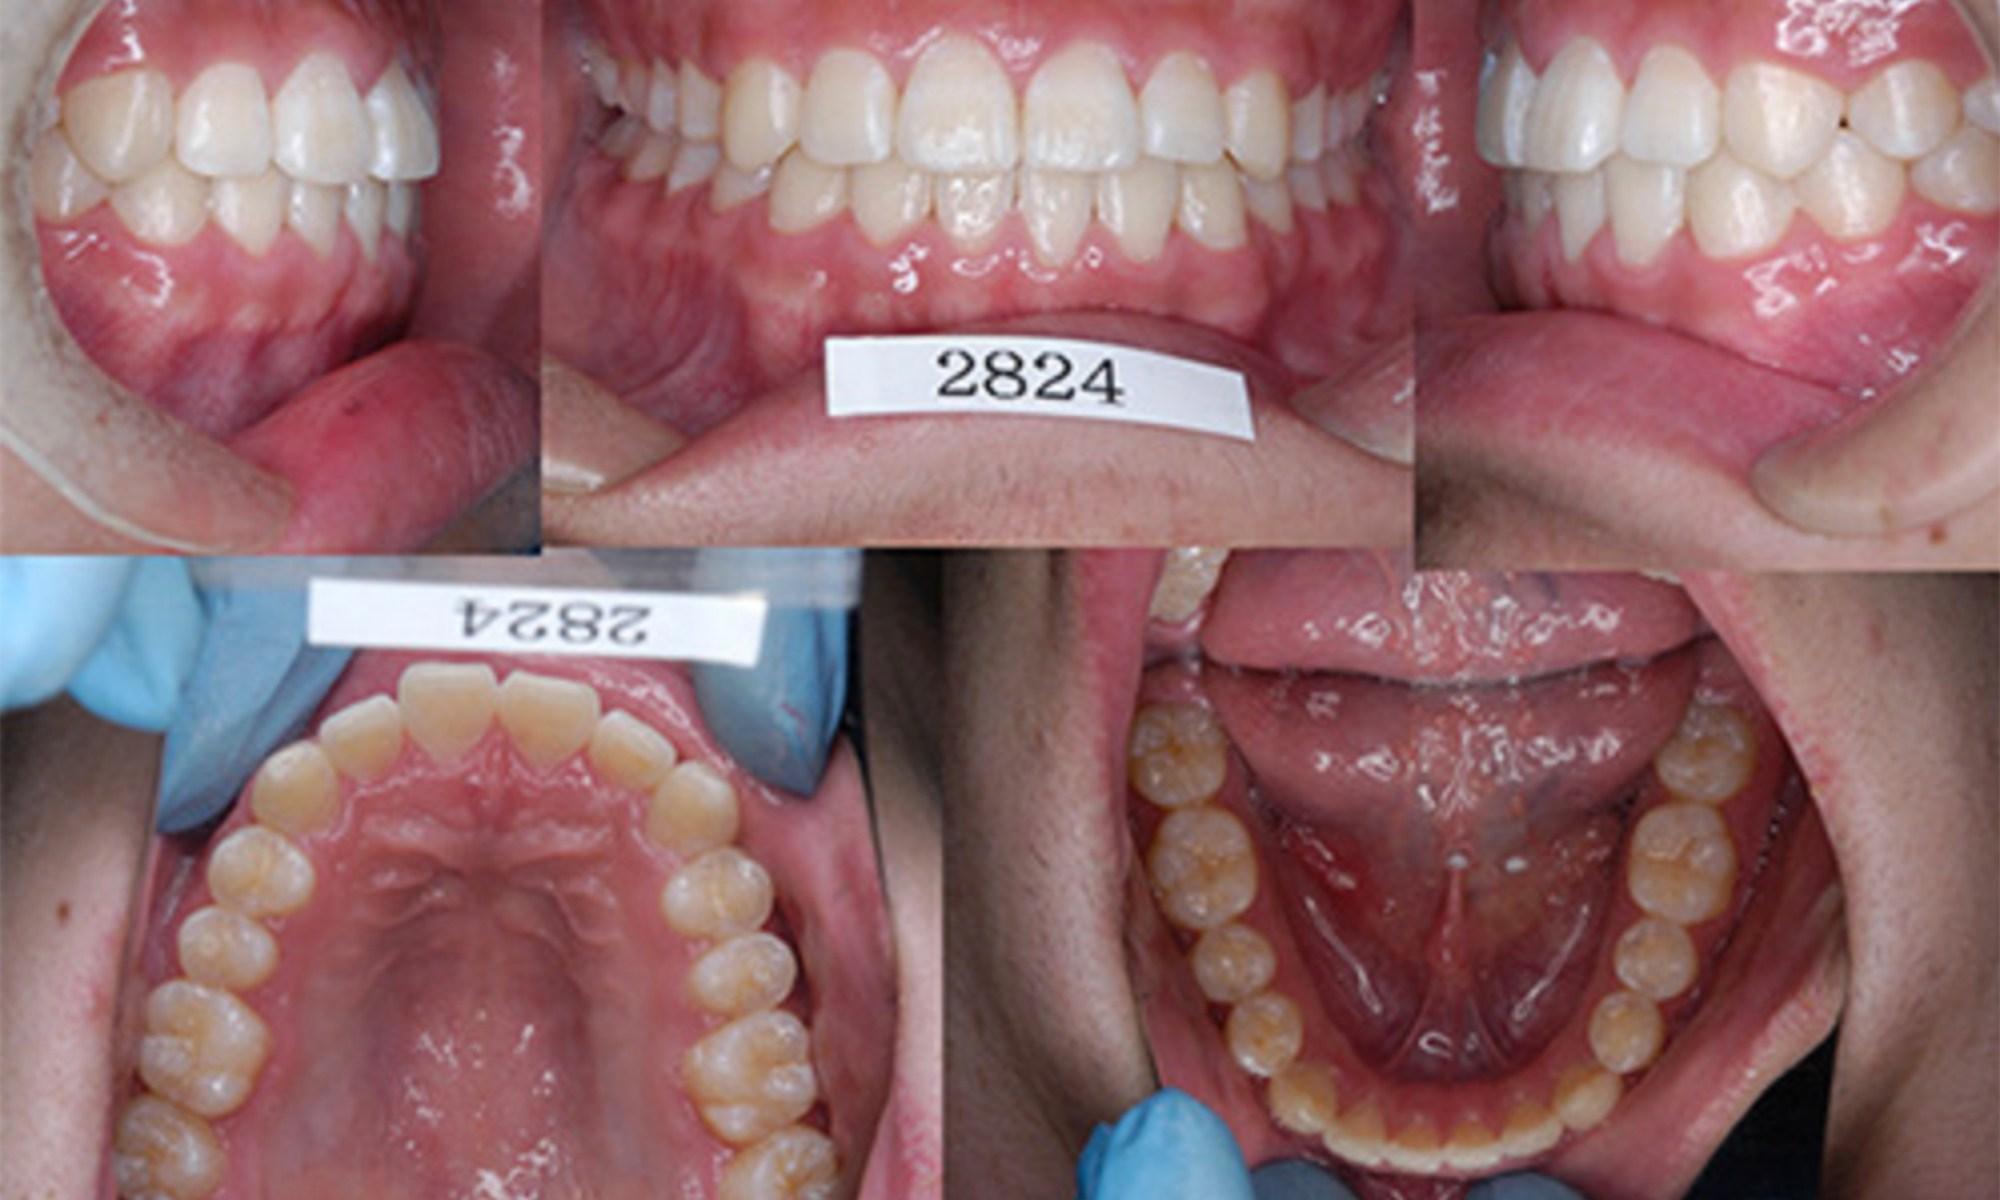 成長期の矯正歯科治療で体格改善